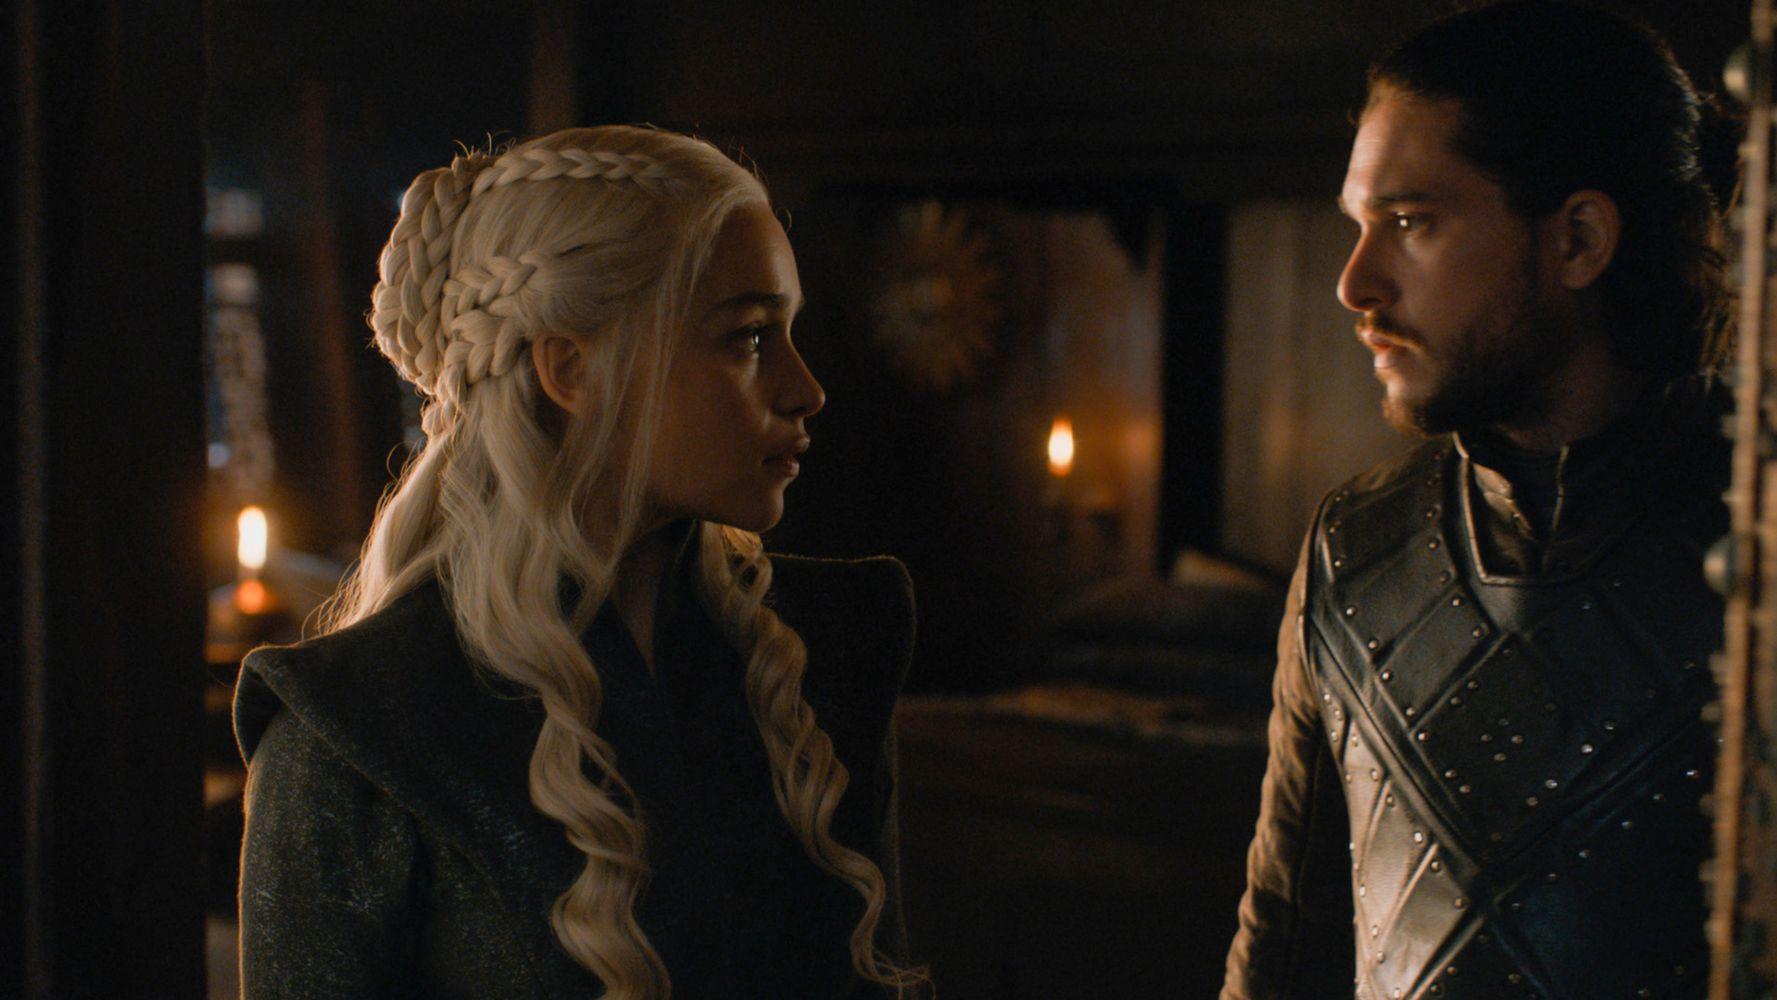 7 Disturbing, Fiery & Icy 'Game Of Thrones' Secrets You Didn